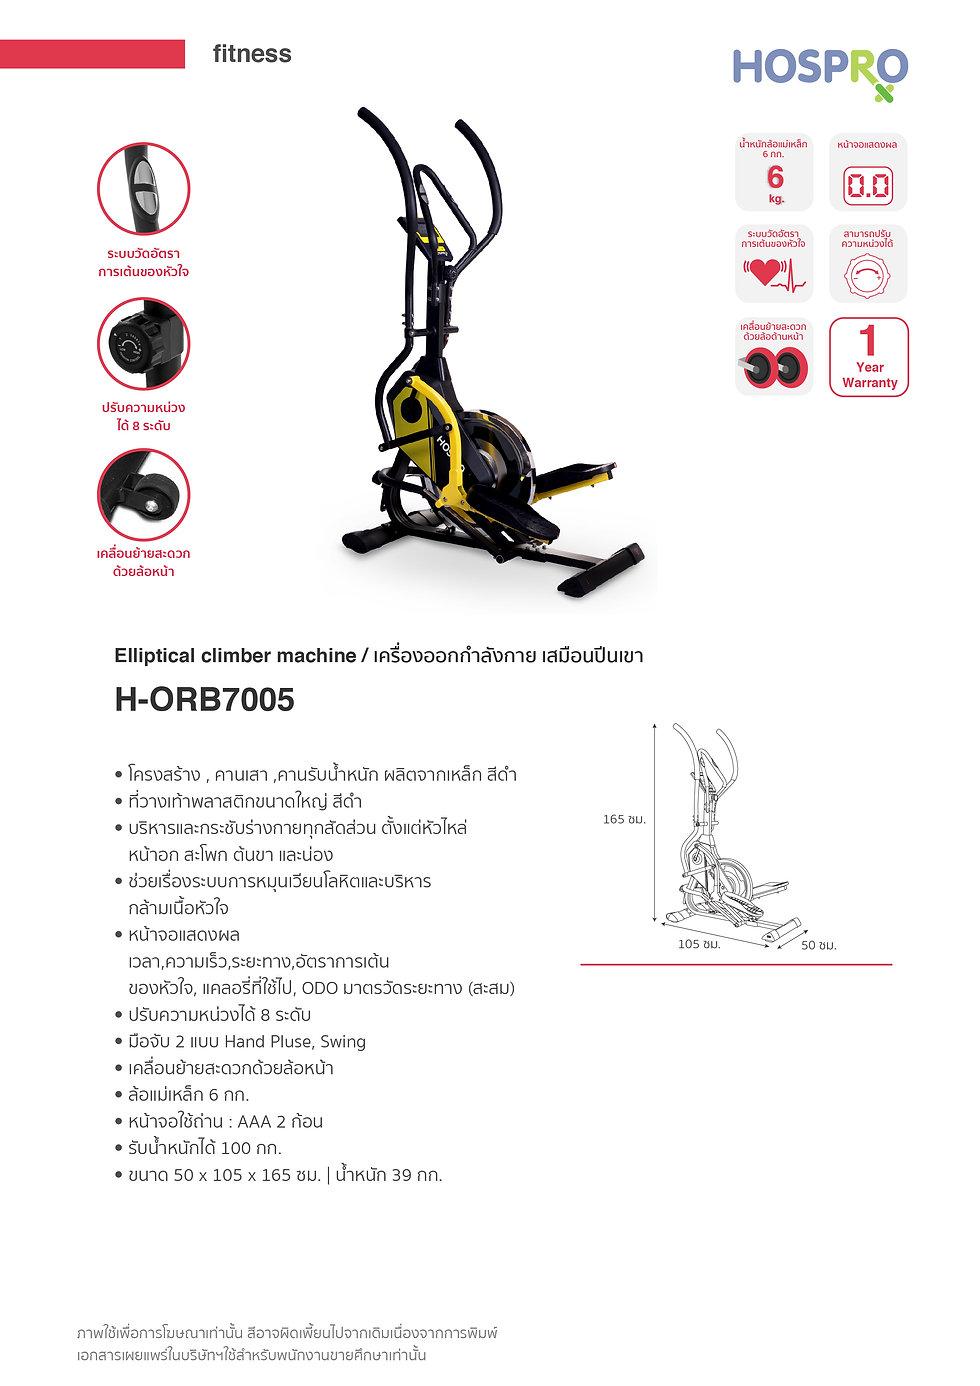 H-ORB7005.jpg